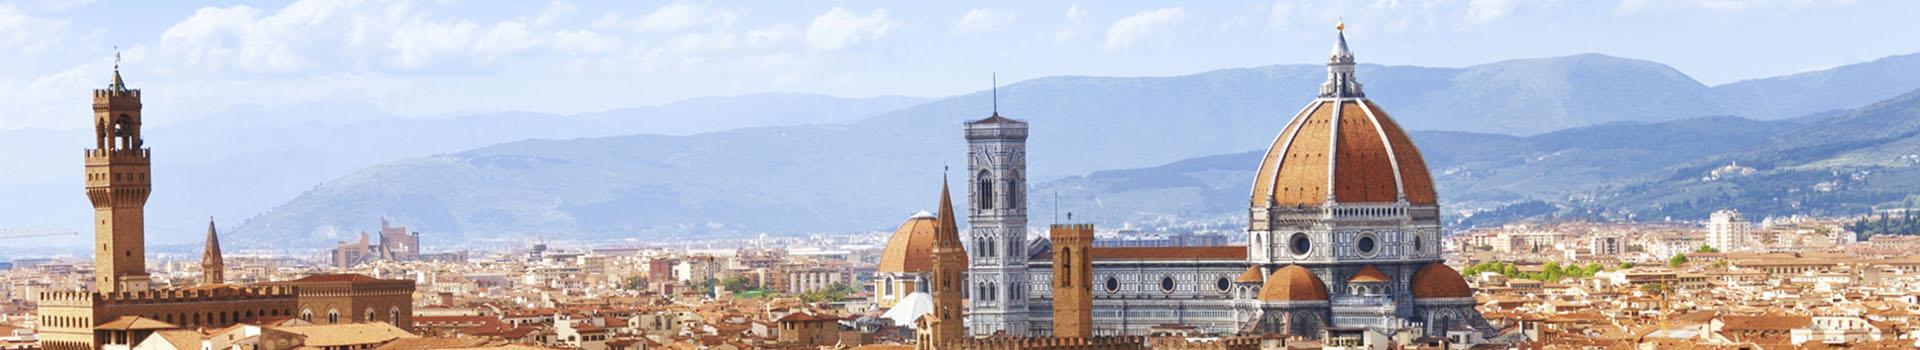 Firenze - Kemiplast